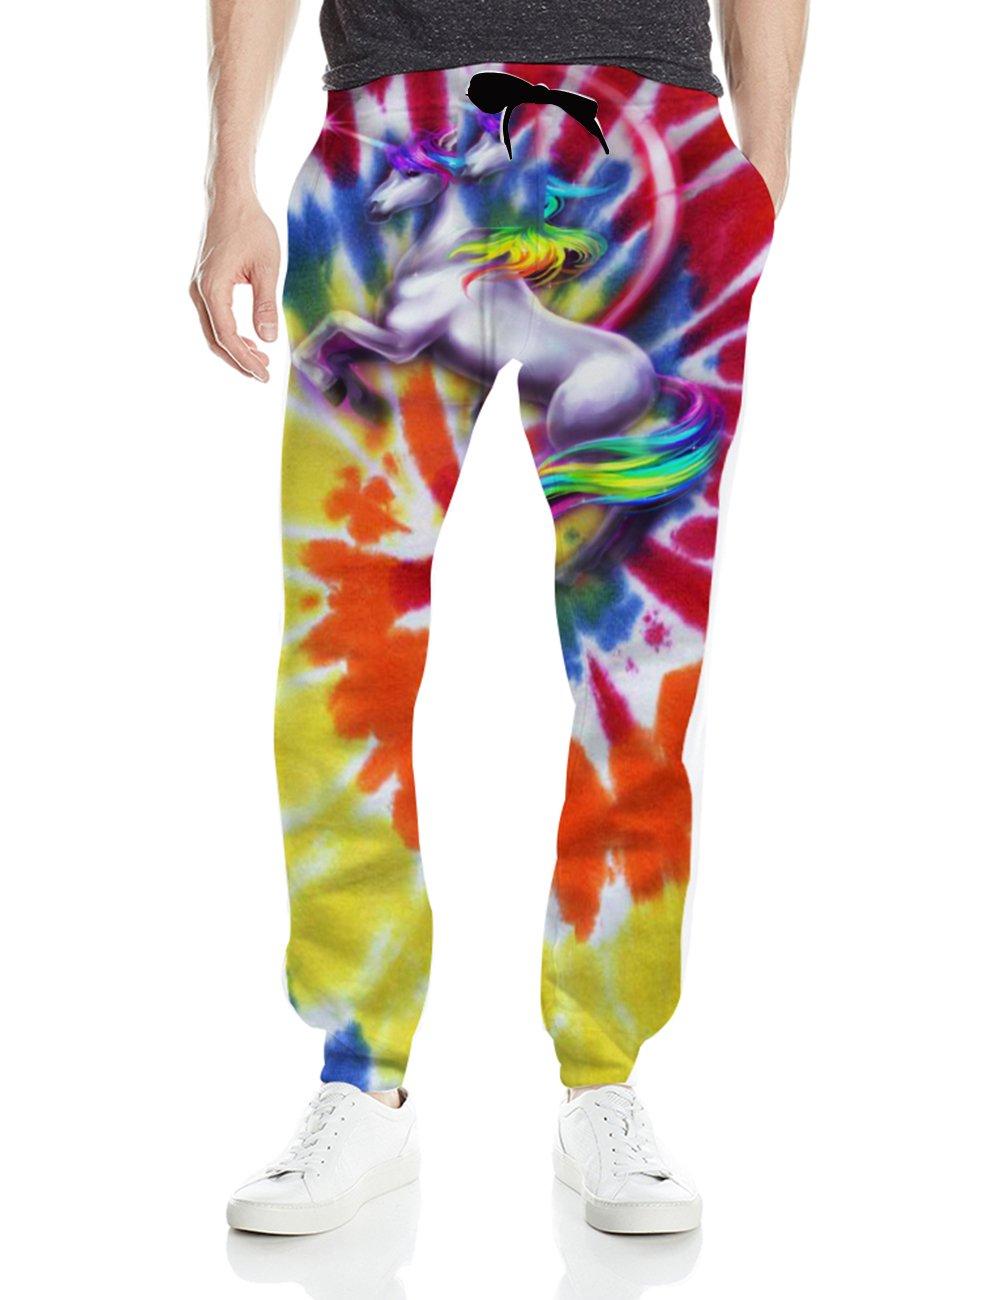 BFUSTYLE Unisex 3D Digital Print Graphic Gym Sport Jogging Pants Casual Sweatpants